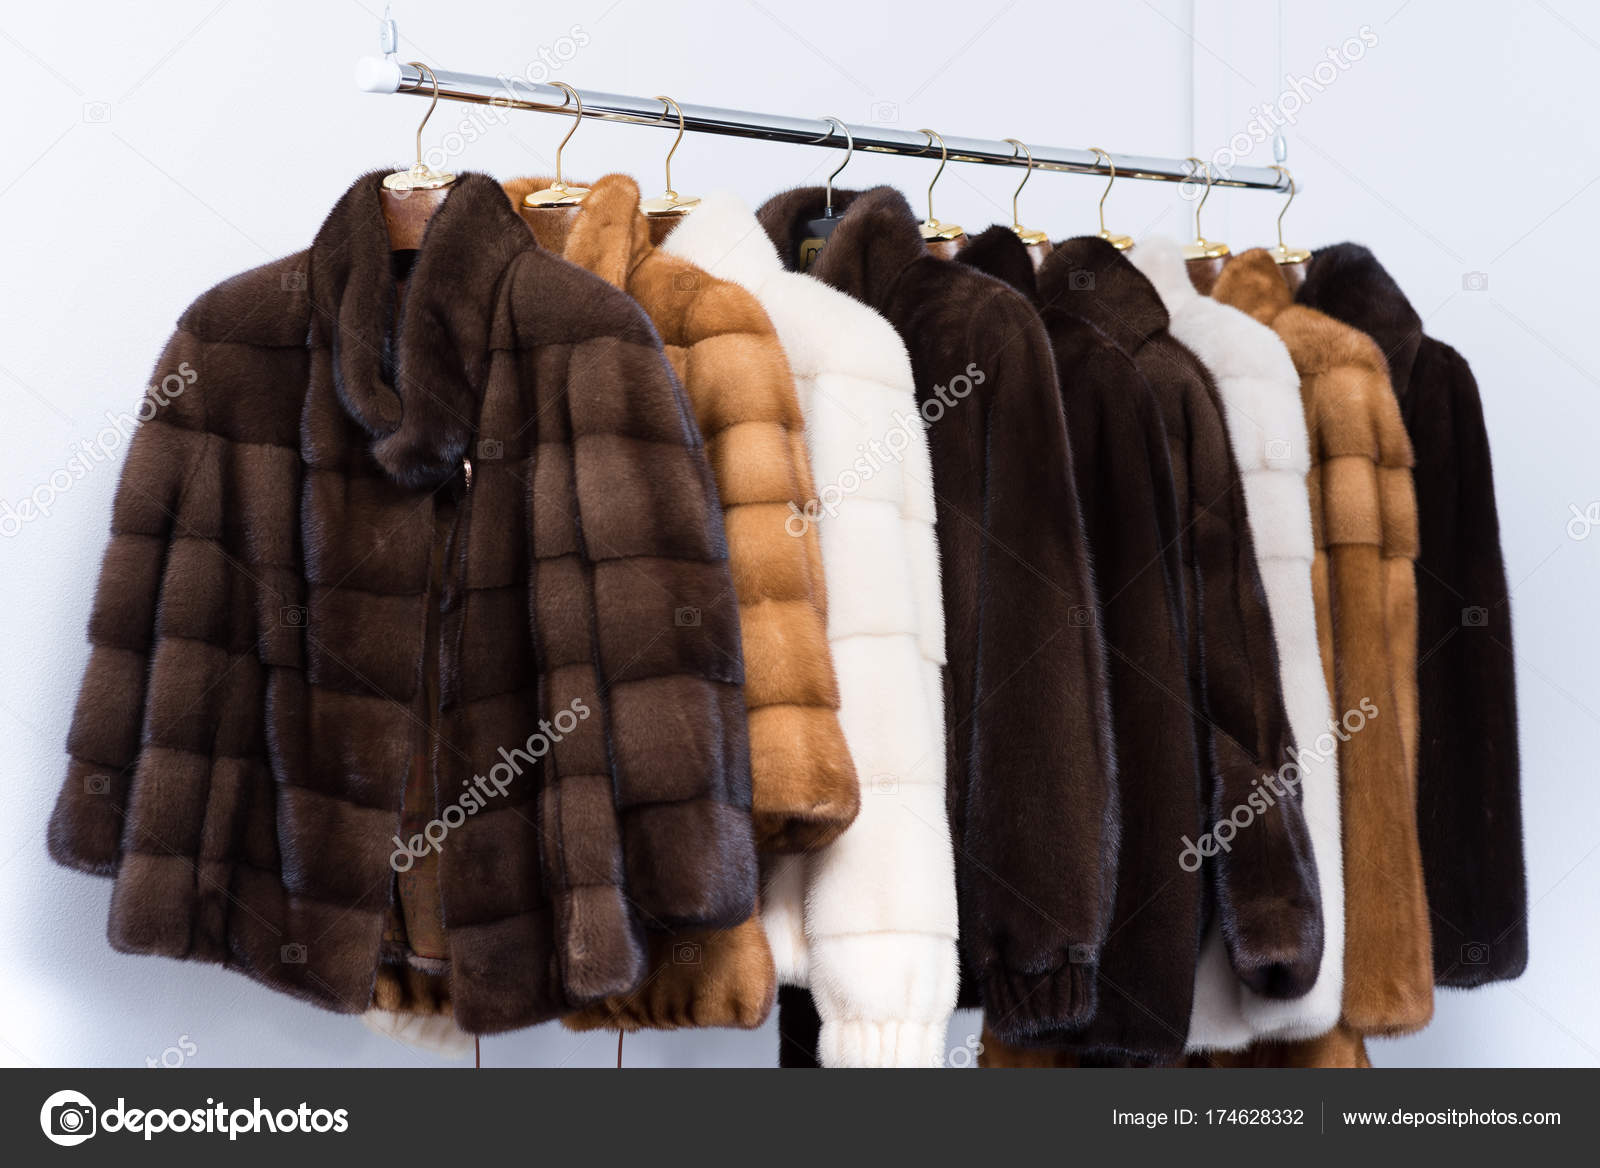 69d8bc2ce4e5 Γούνινα παλτά στις κρεμάστρες Μυρταριώτισσα-Ρουκουνιώτης– εικόνα αρχείου